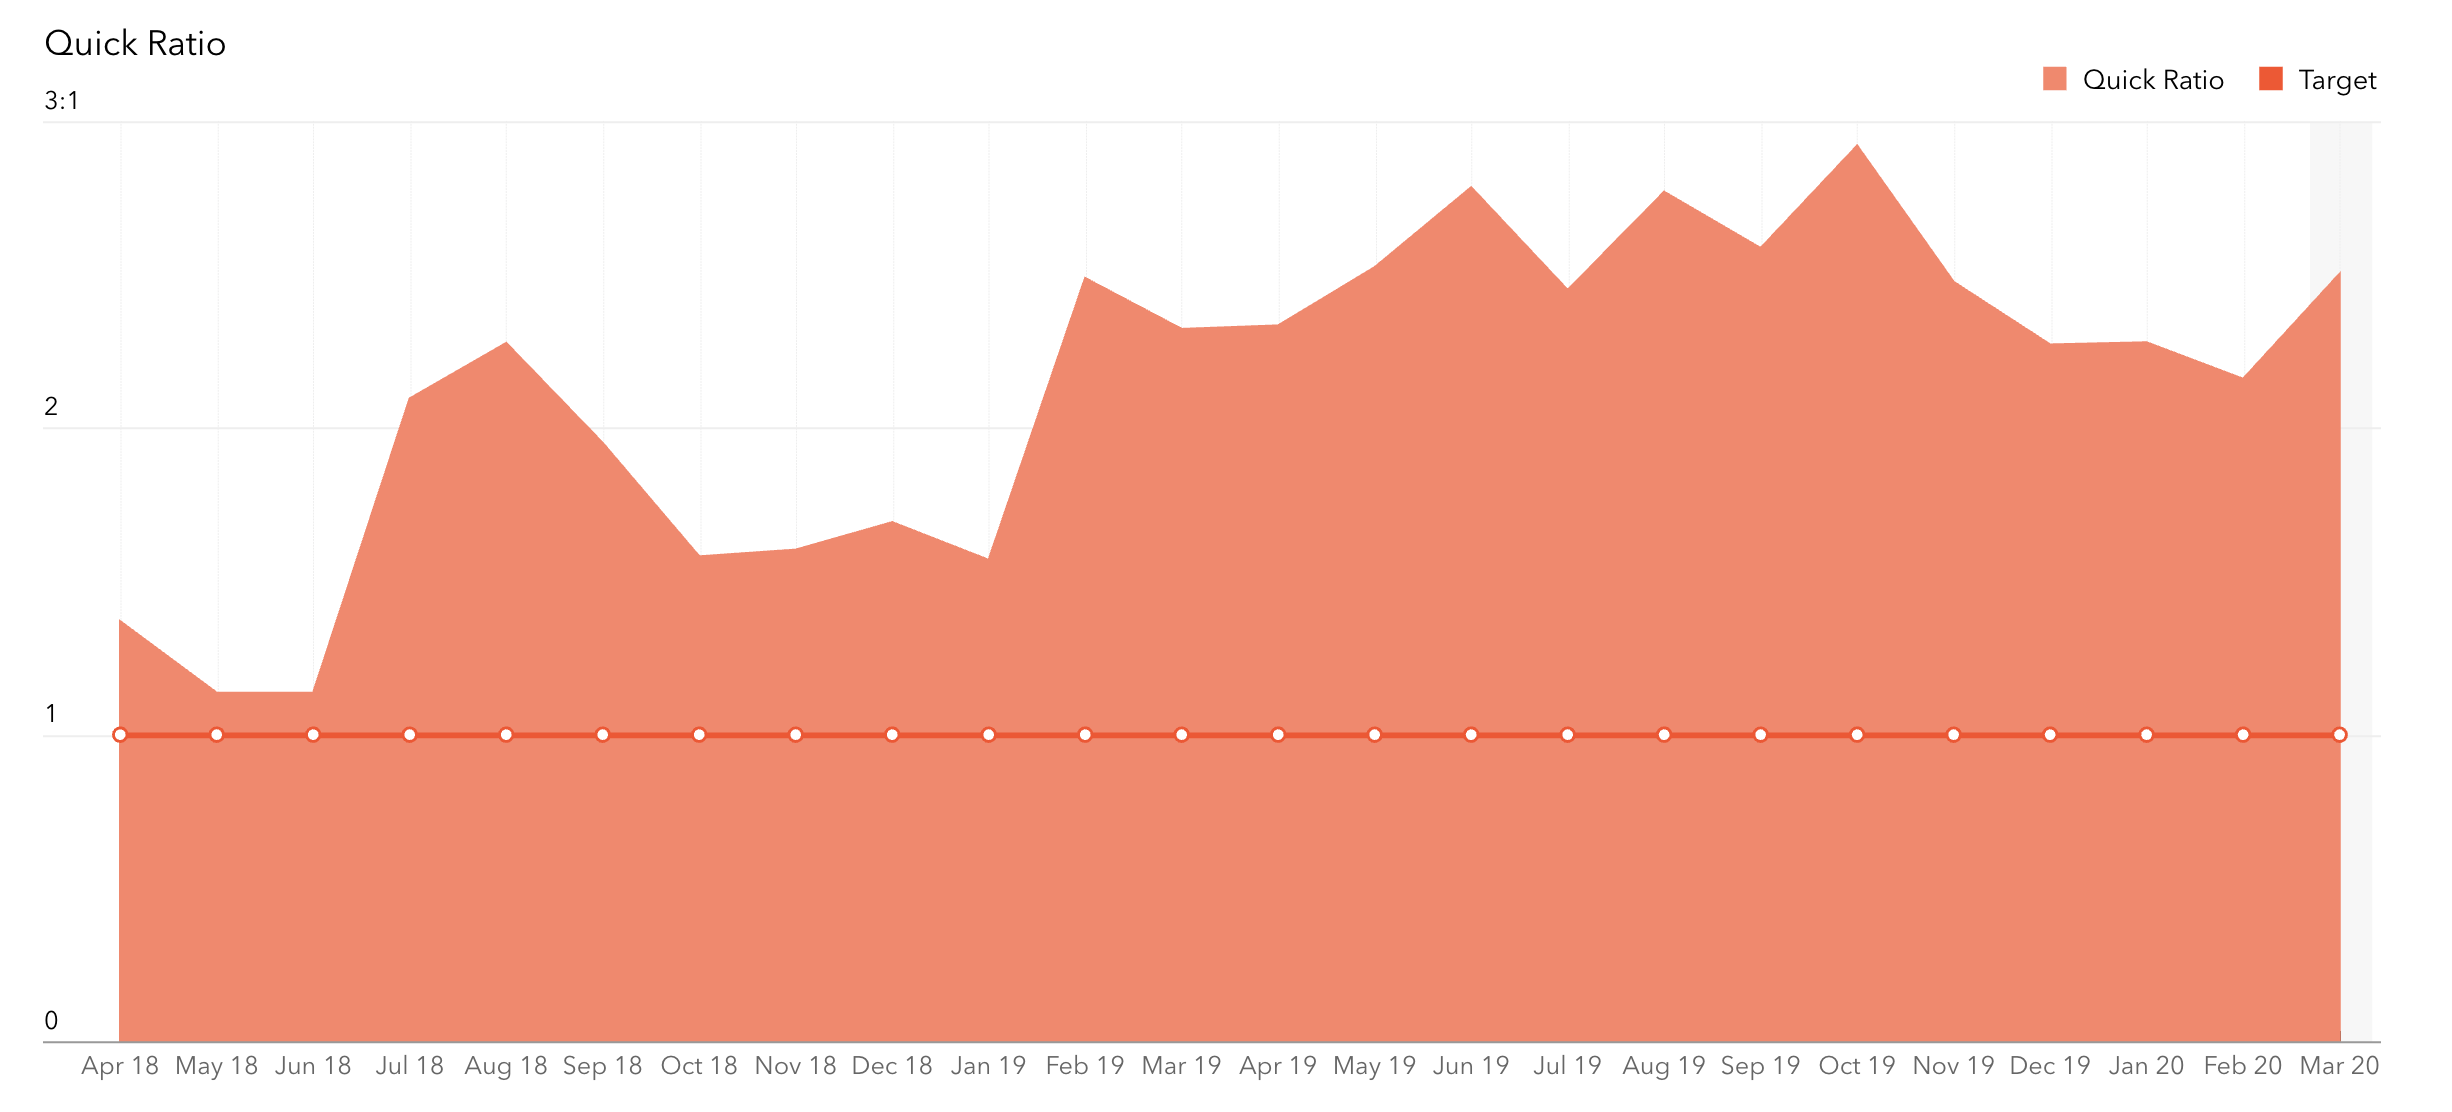 Chart-9-Quick-ratio-vs-Target-of-1-1